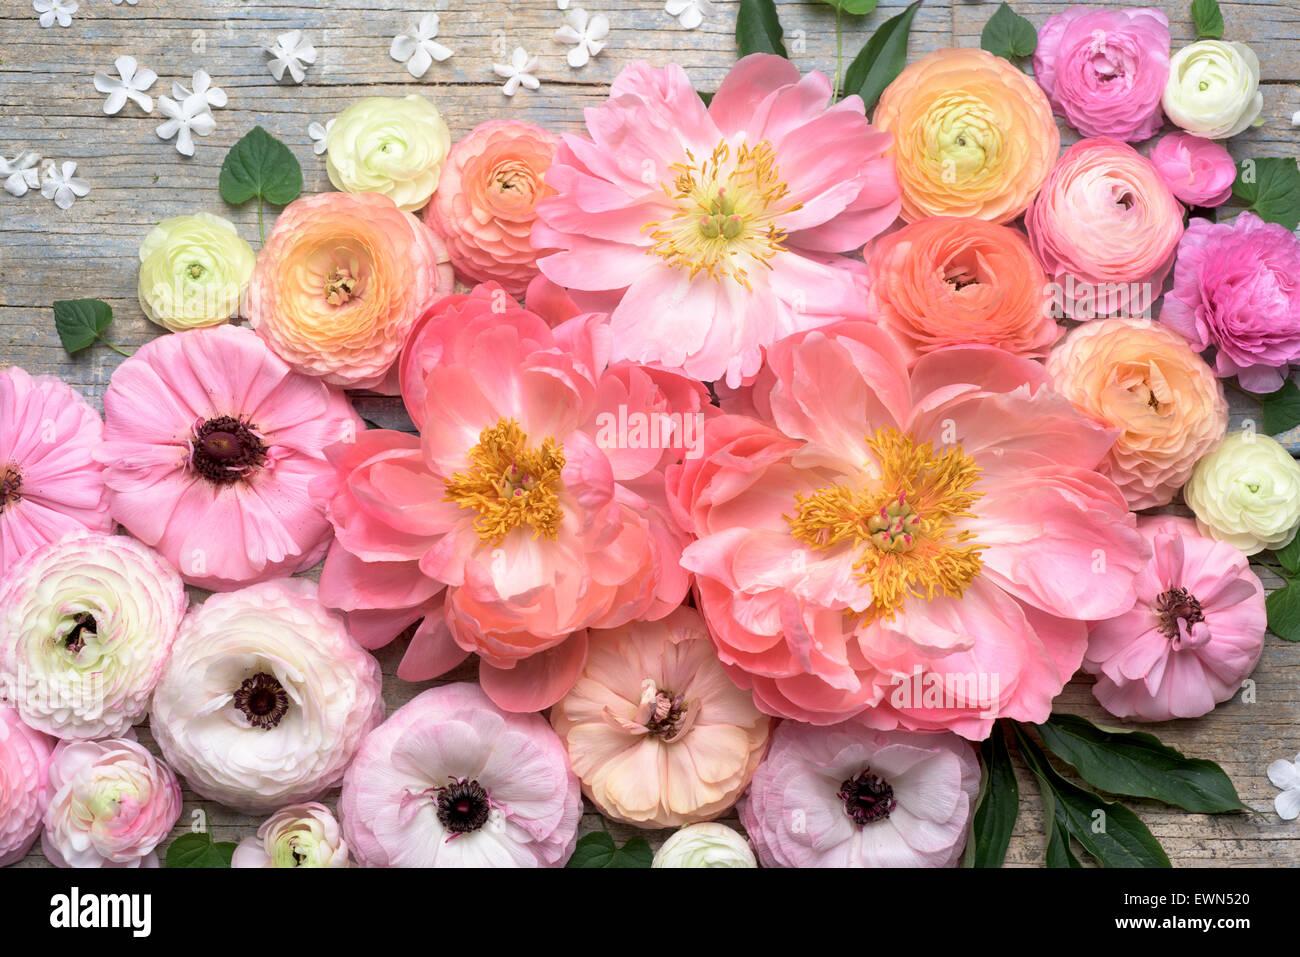 Overhead shot of ranunculus, peonies and anemones - Stock Image